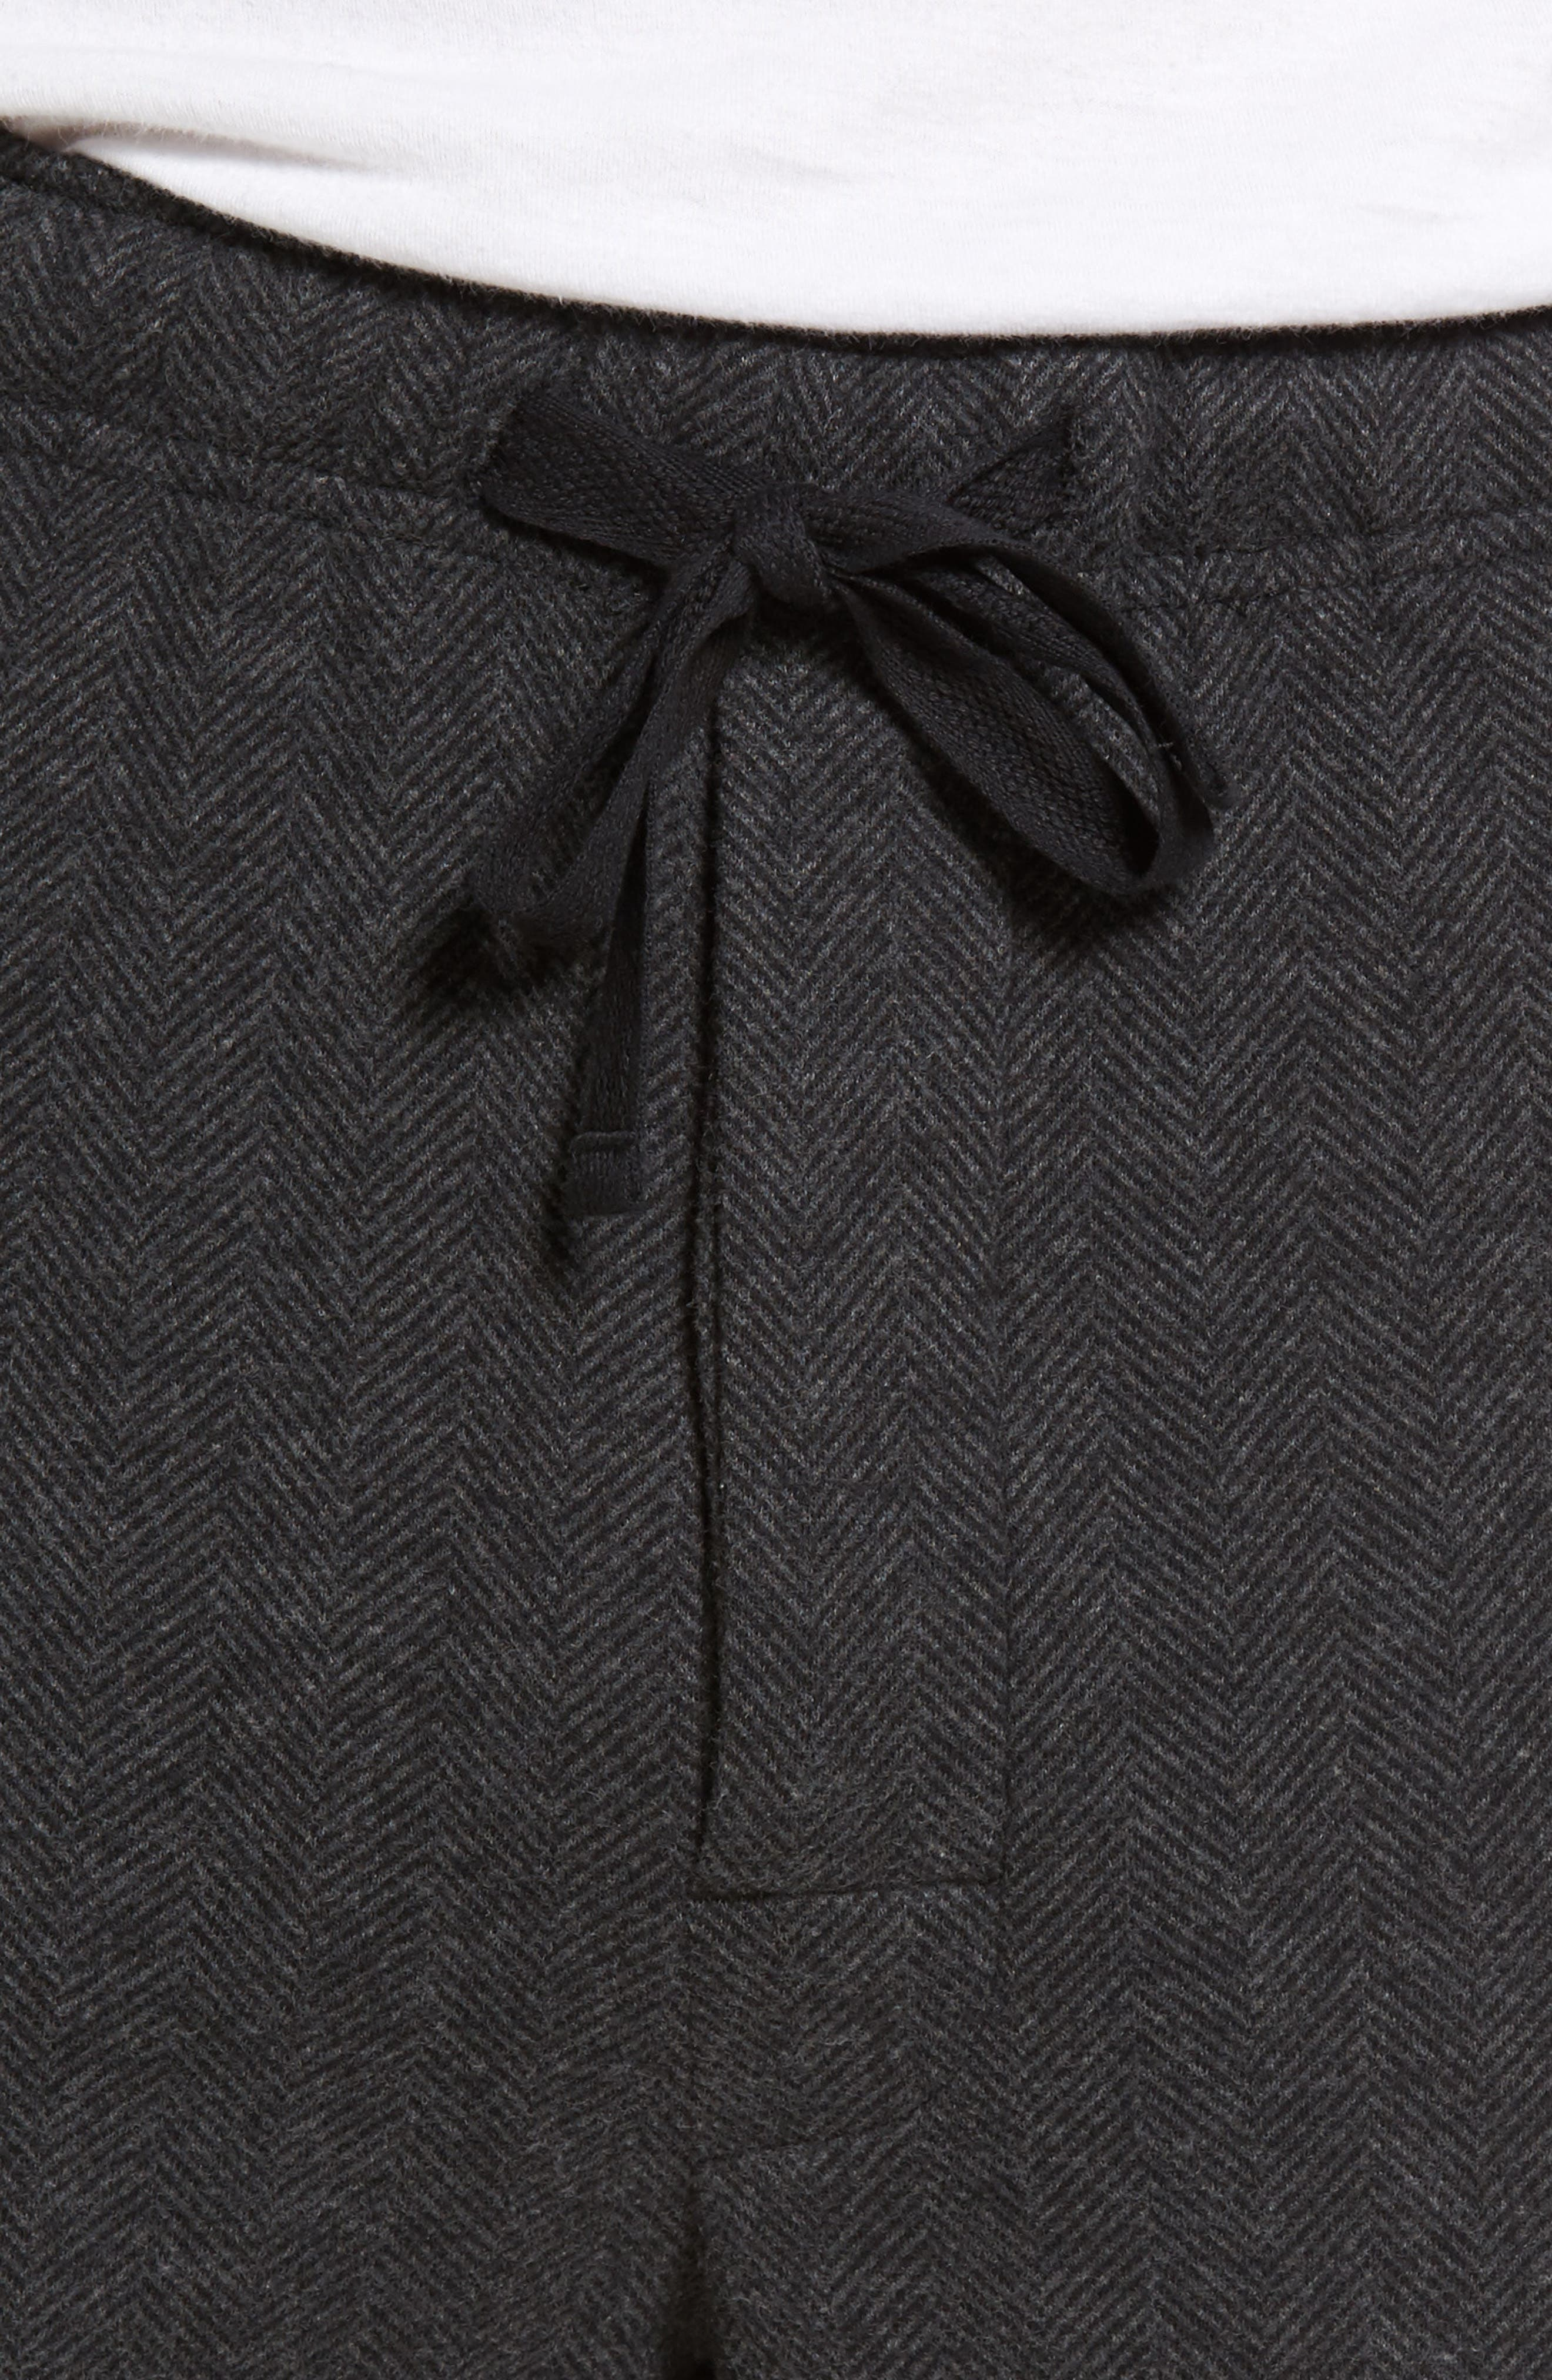 Grayson Lounge Pants,                             Alternate thumbnail 4, color,                             Charcoal